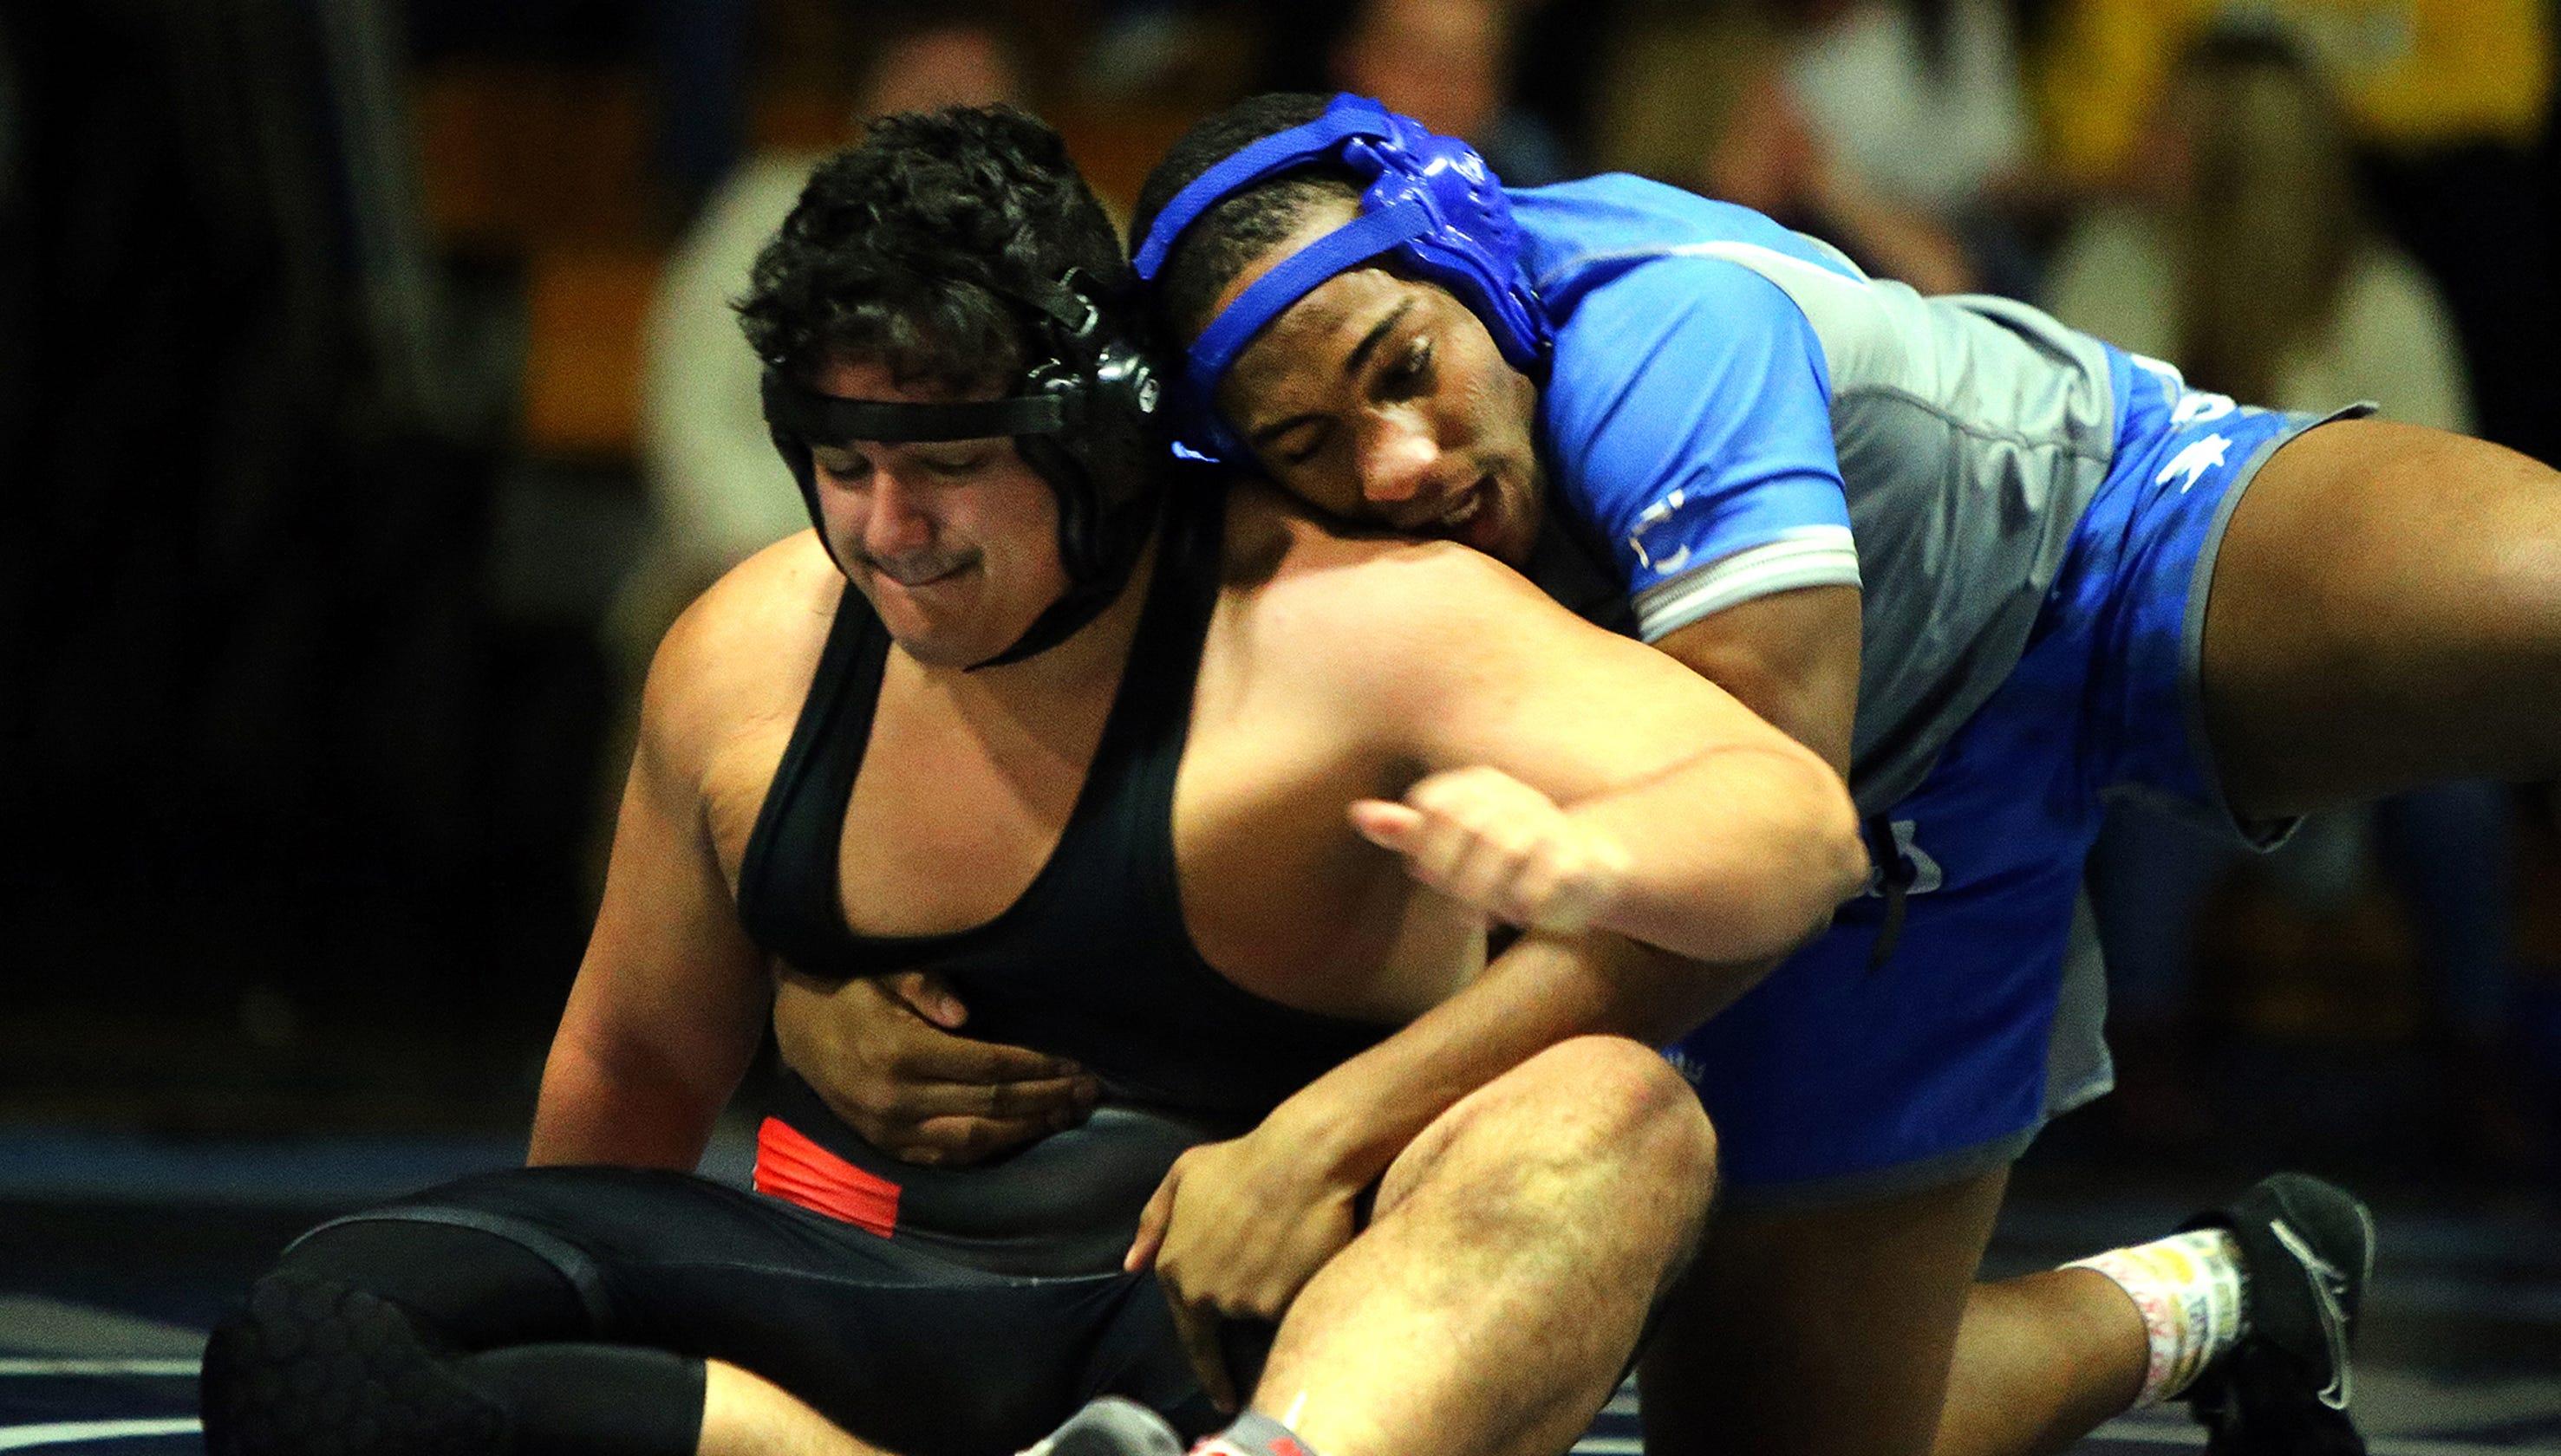 NJ wrestling: Tournament results, Thursday, Dec  27